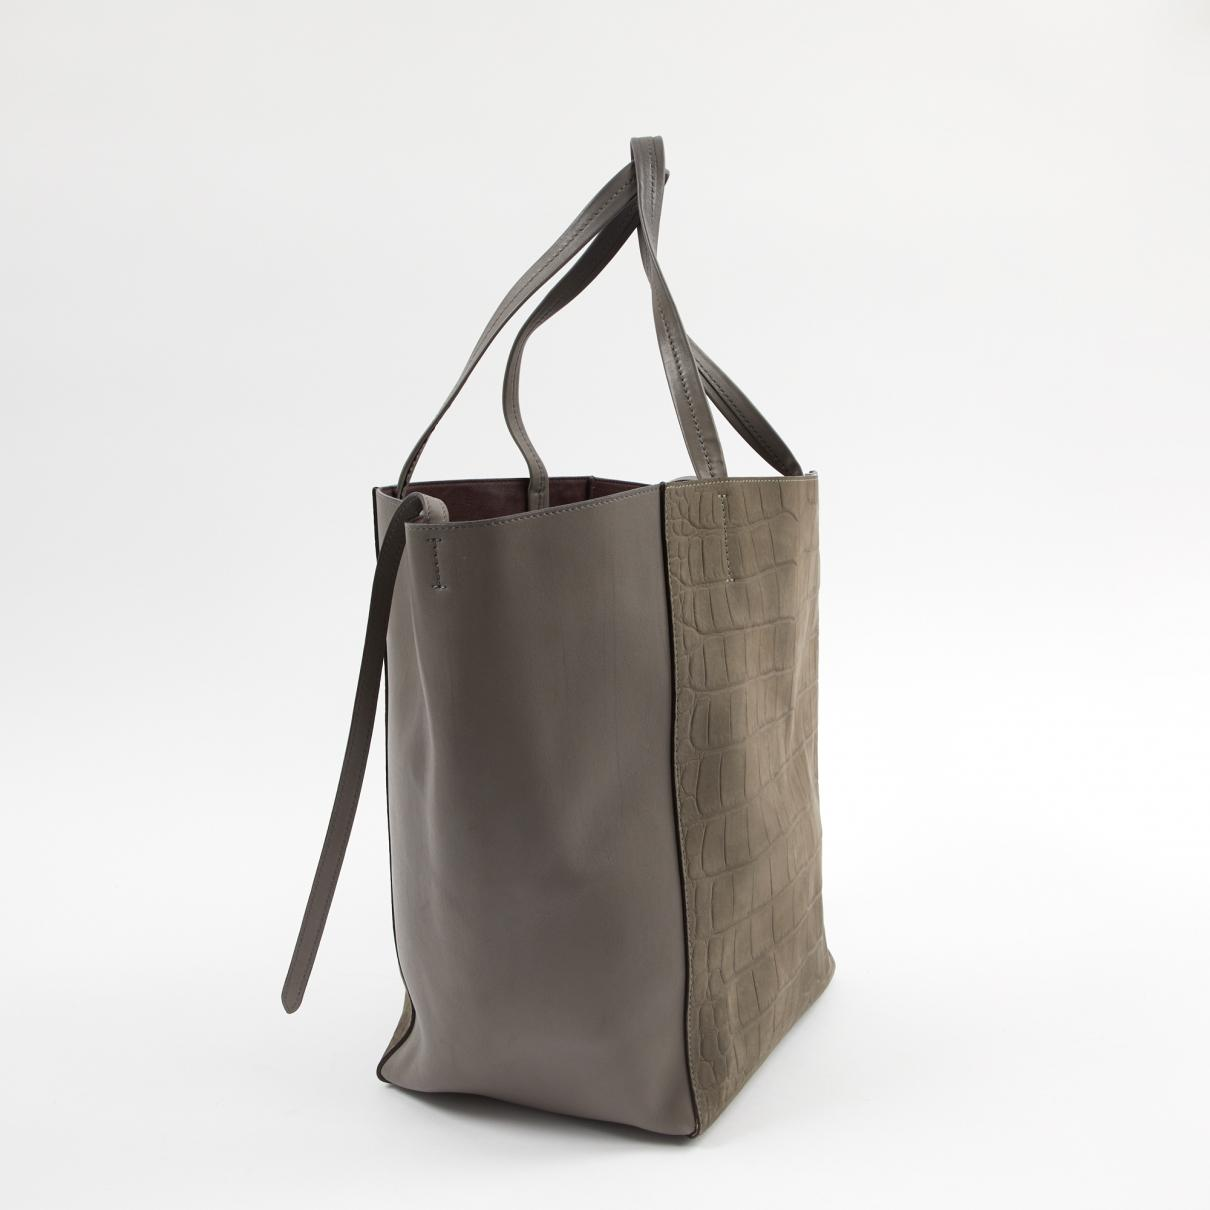 df6cdf9fbd19 Céline - Multicolor Cabas Phantom Other Leather Handbag - Lyst. View  fullscreen